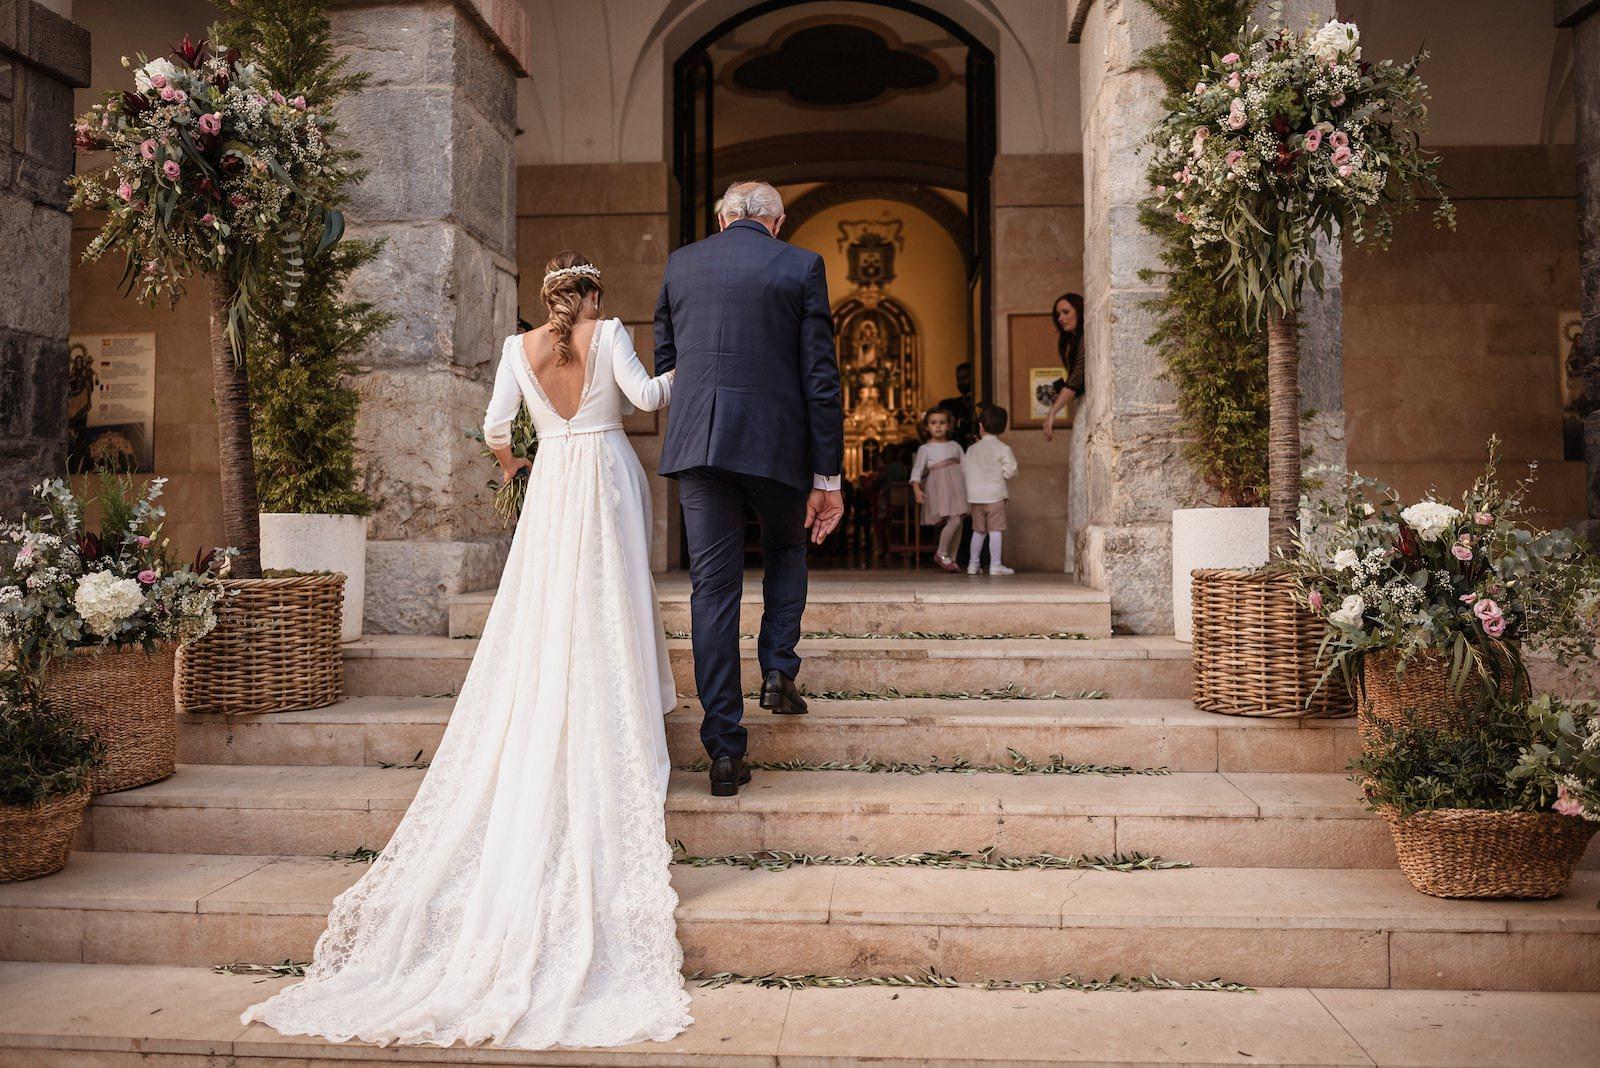 fotografia de boda novia con su padre subiendo escaleras murcia